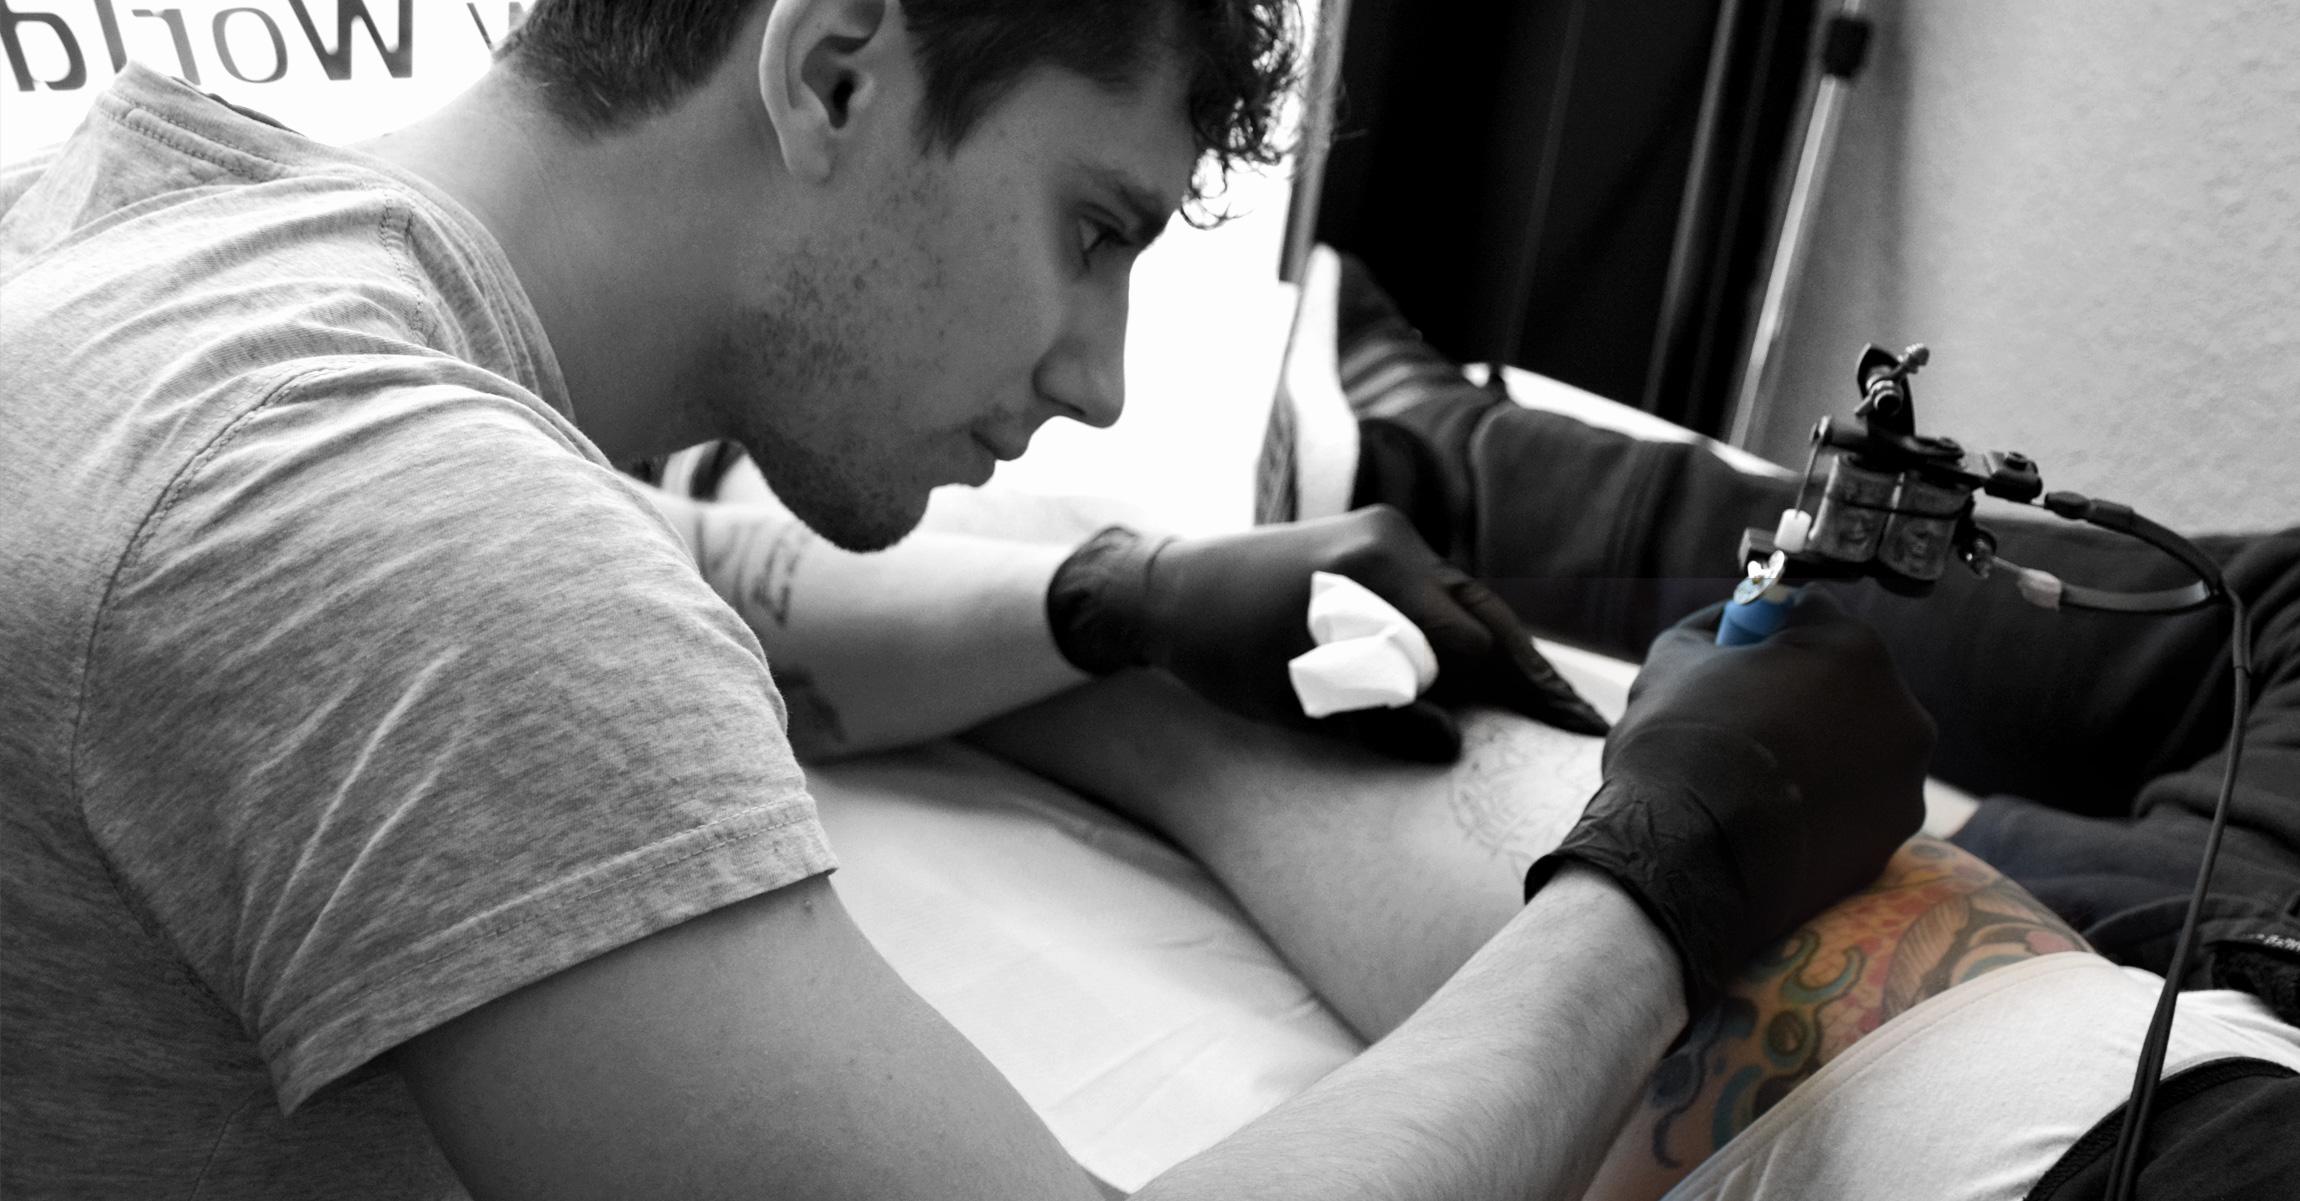 paolo-perego-tattoo